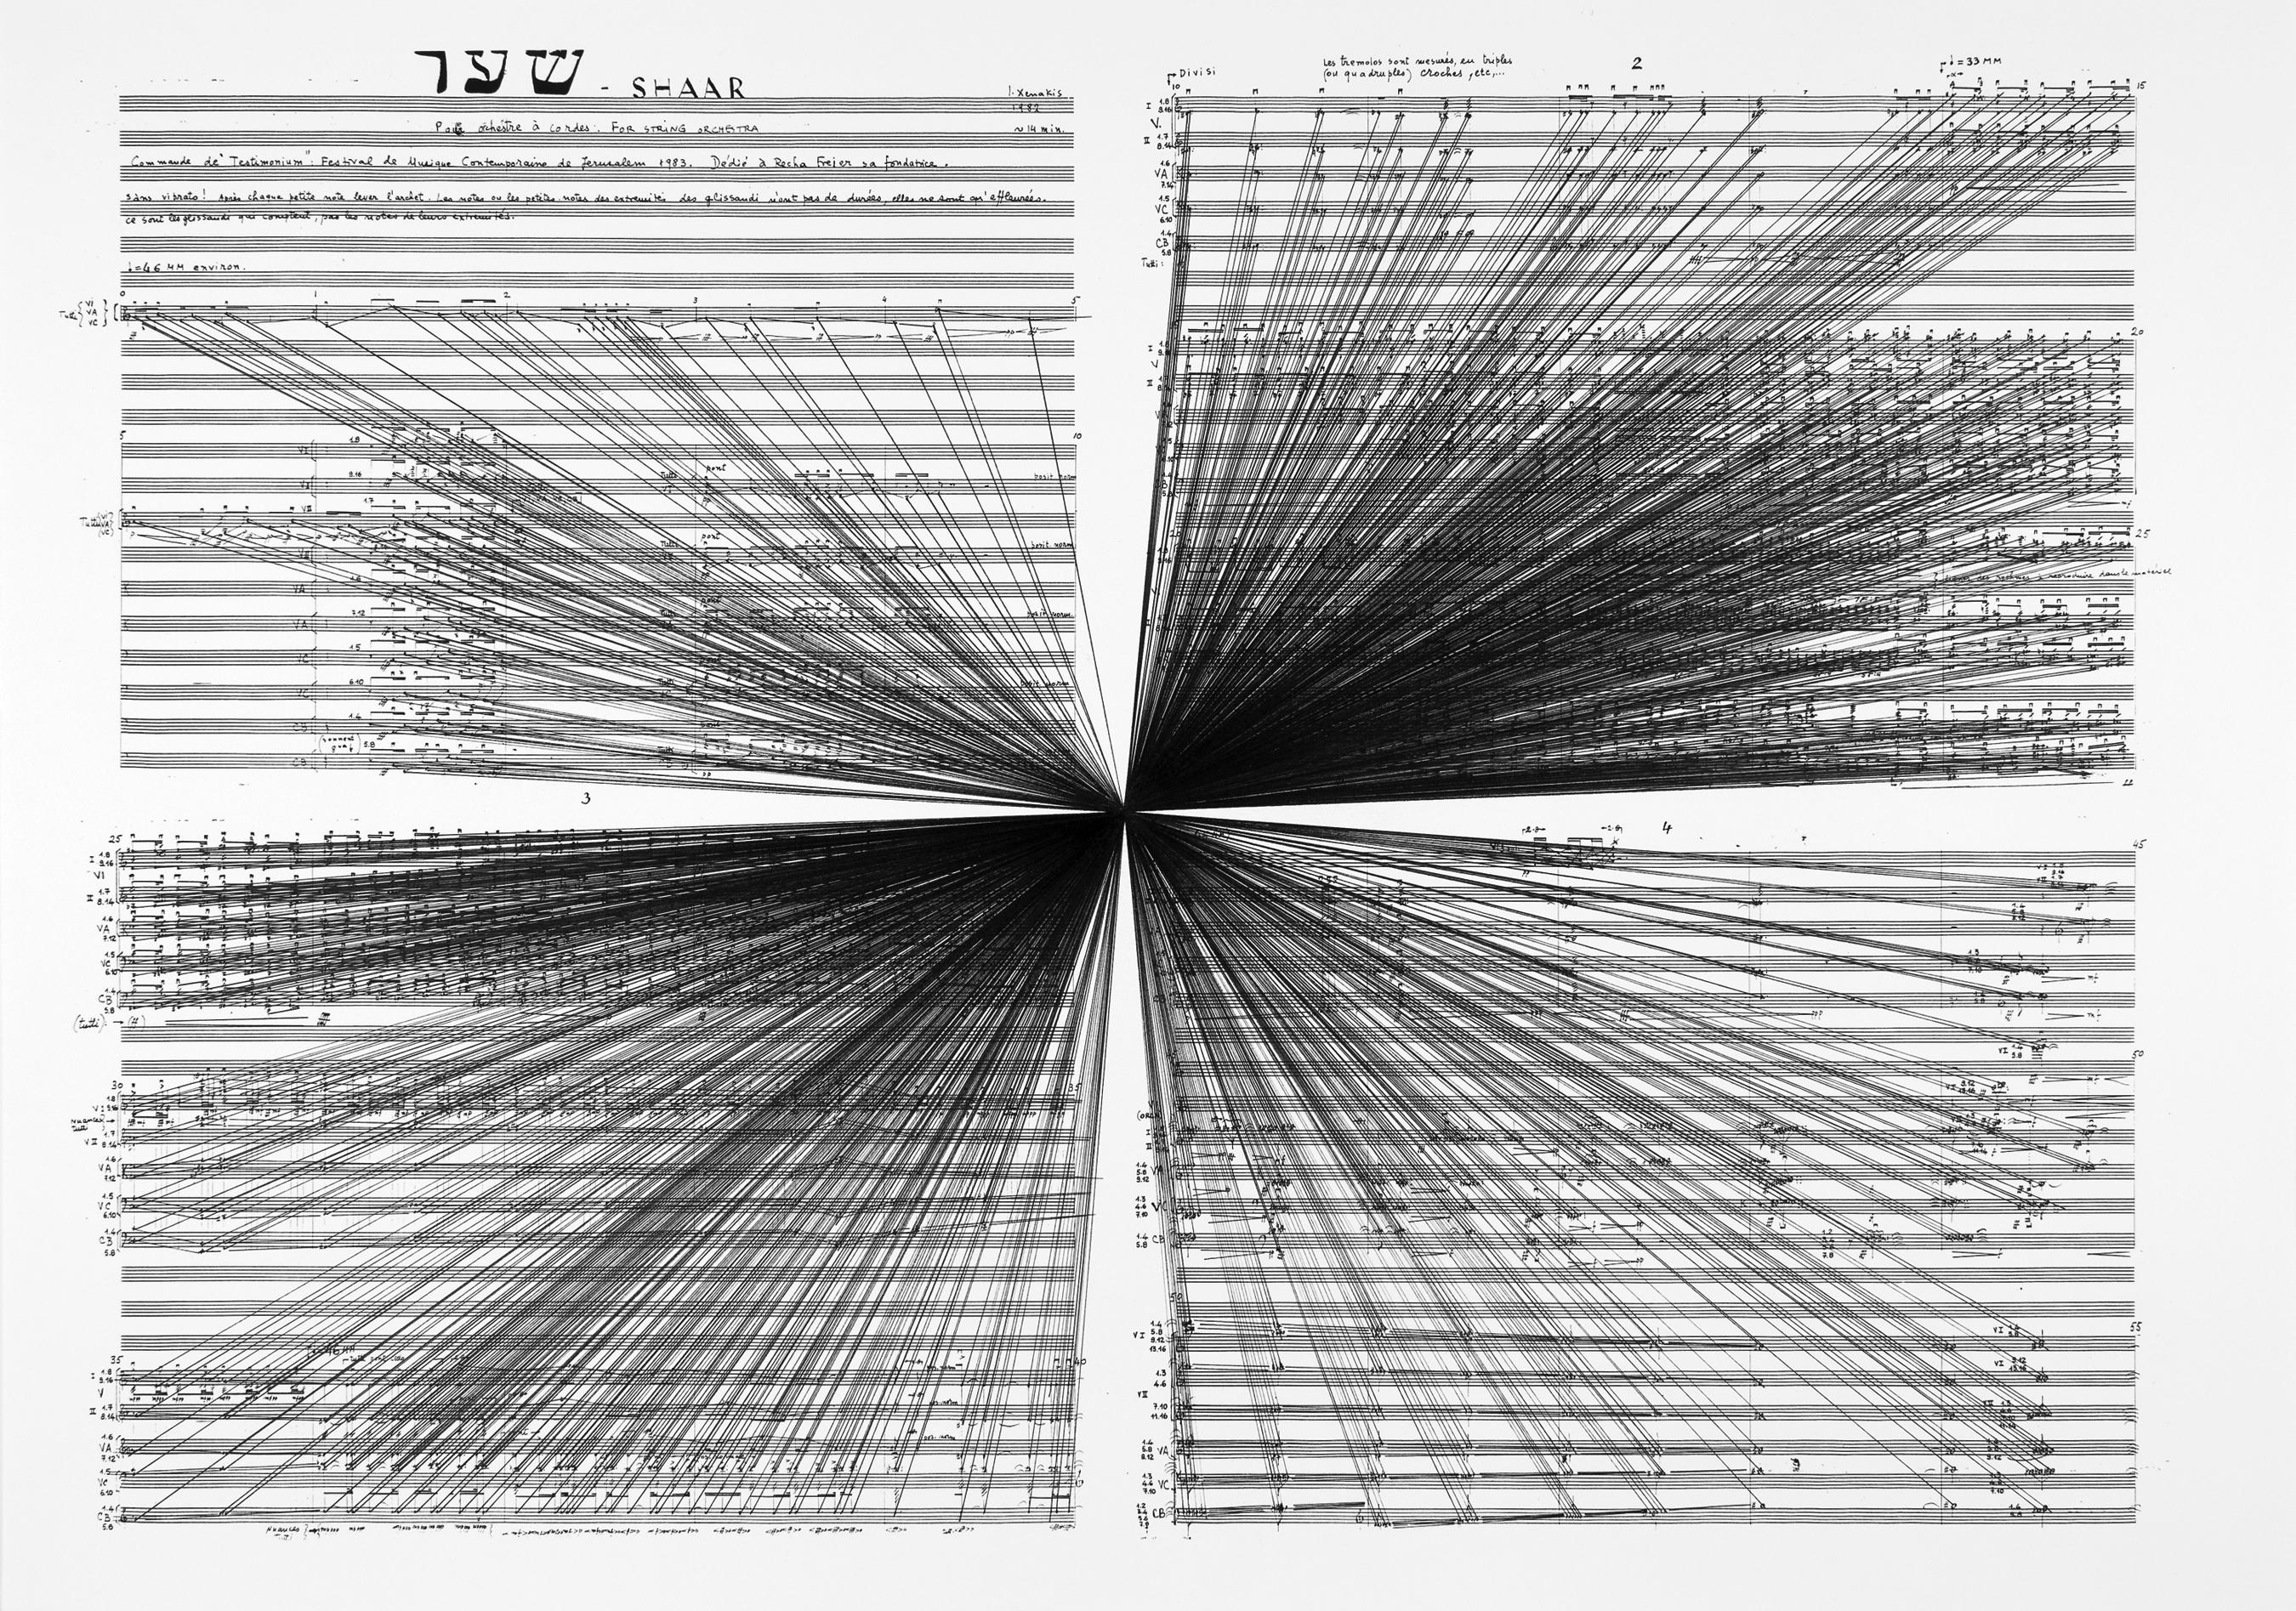 Marco Fusinato. Mass Black Implosion (Shaar, Iannis Xenakis), 2012, ink on archival facsimile of score, Part 1 of 5 parts, 32.3 x 43.1.″